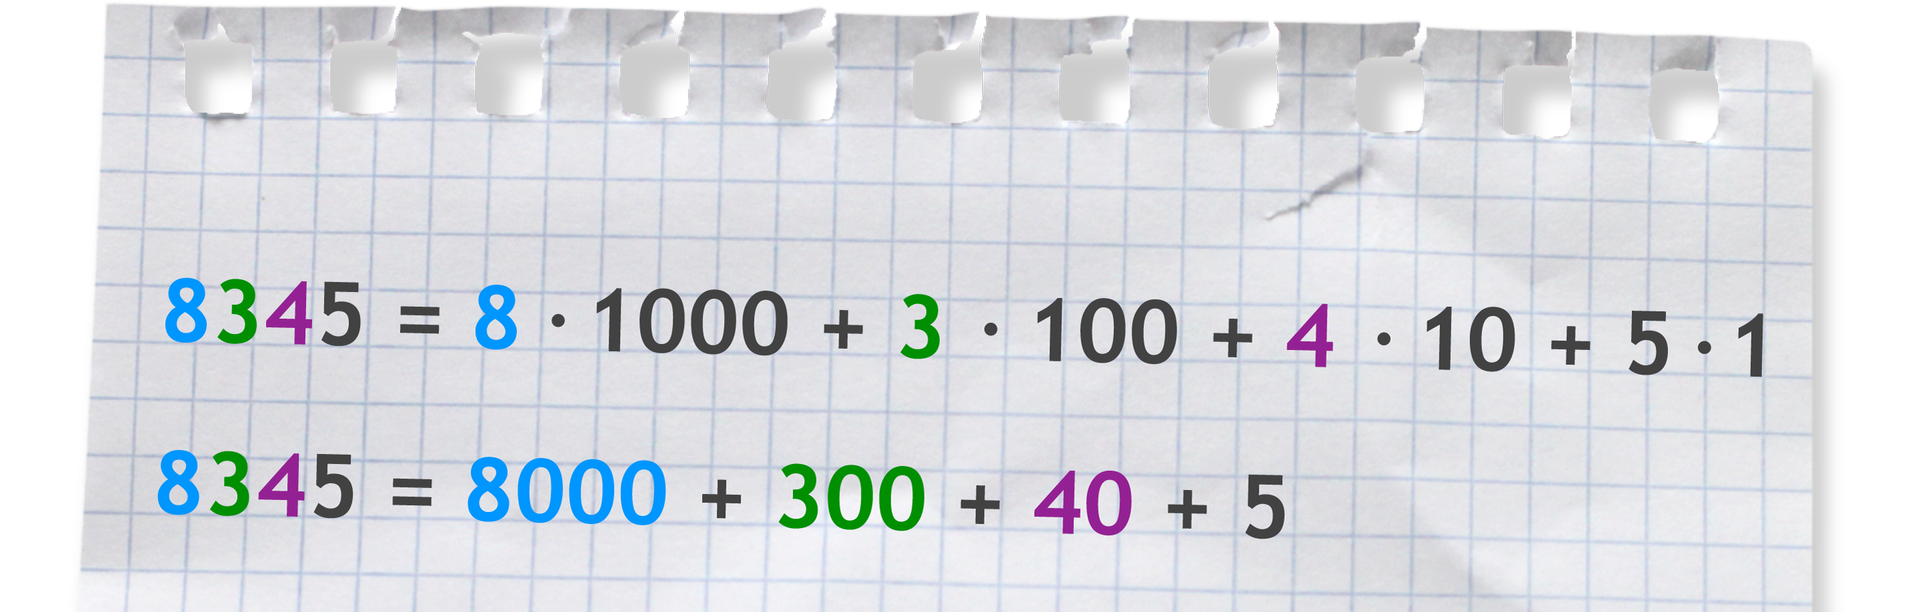 Liczba 8345 =8 razy 1000 +3 razy 100 +4 razy 10 +5 razy 1. 8345 =8000 +300 +40 +5